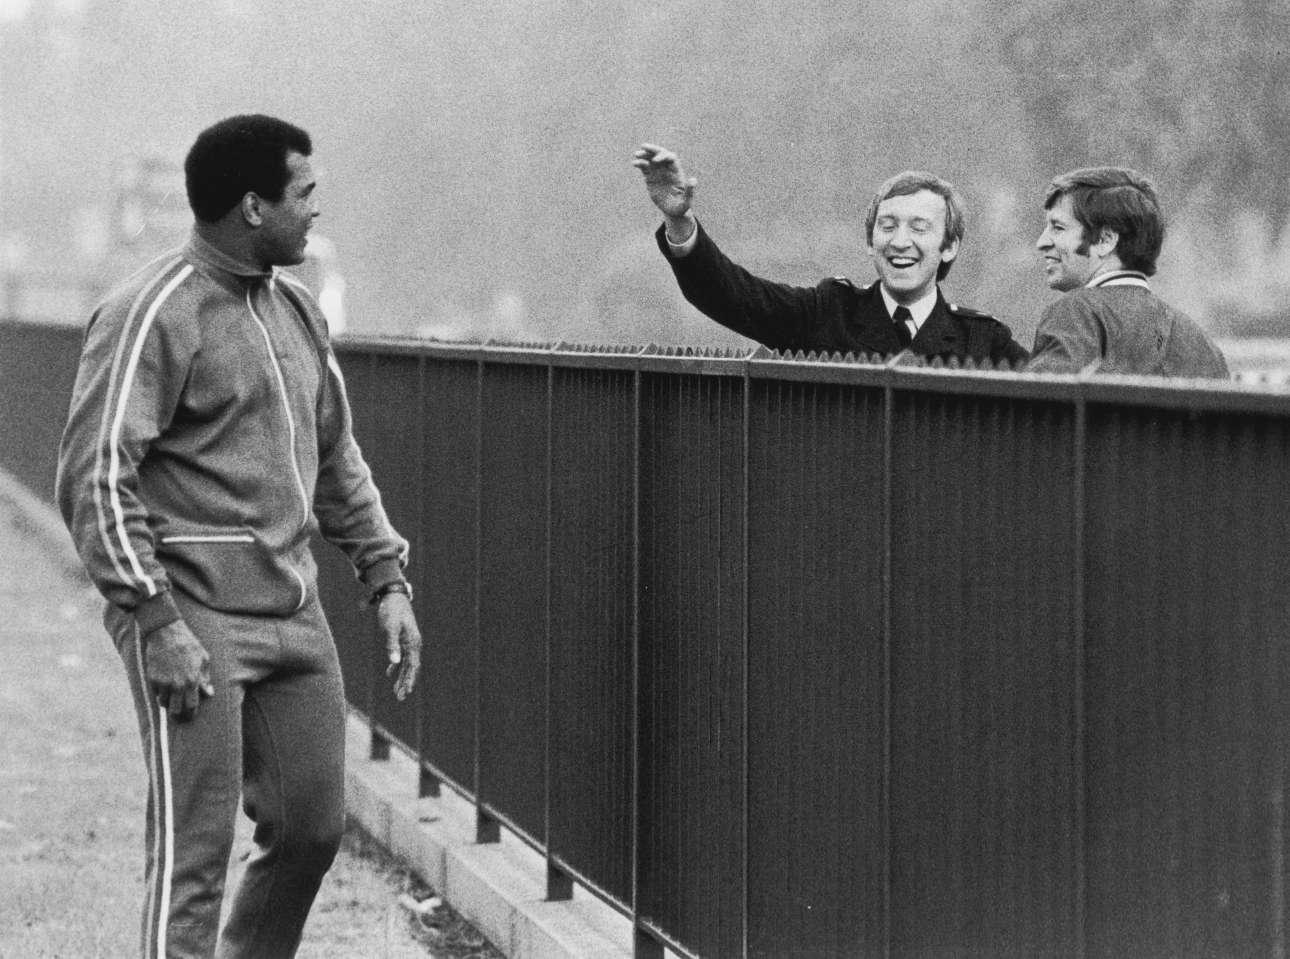 O ύστερος Αλι. Το 1977 προπονείται στο Χάιντ Παρκ του Λονδίνου. Δύο αστυνομικοί τον χαιρετούν